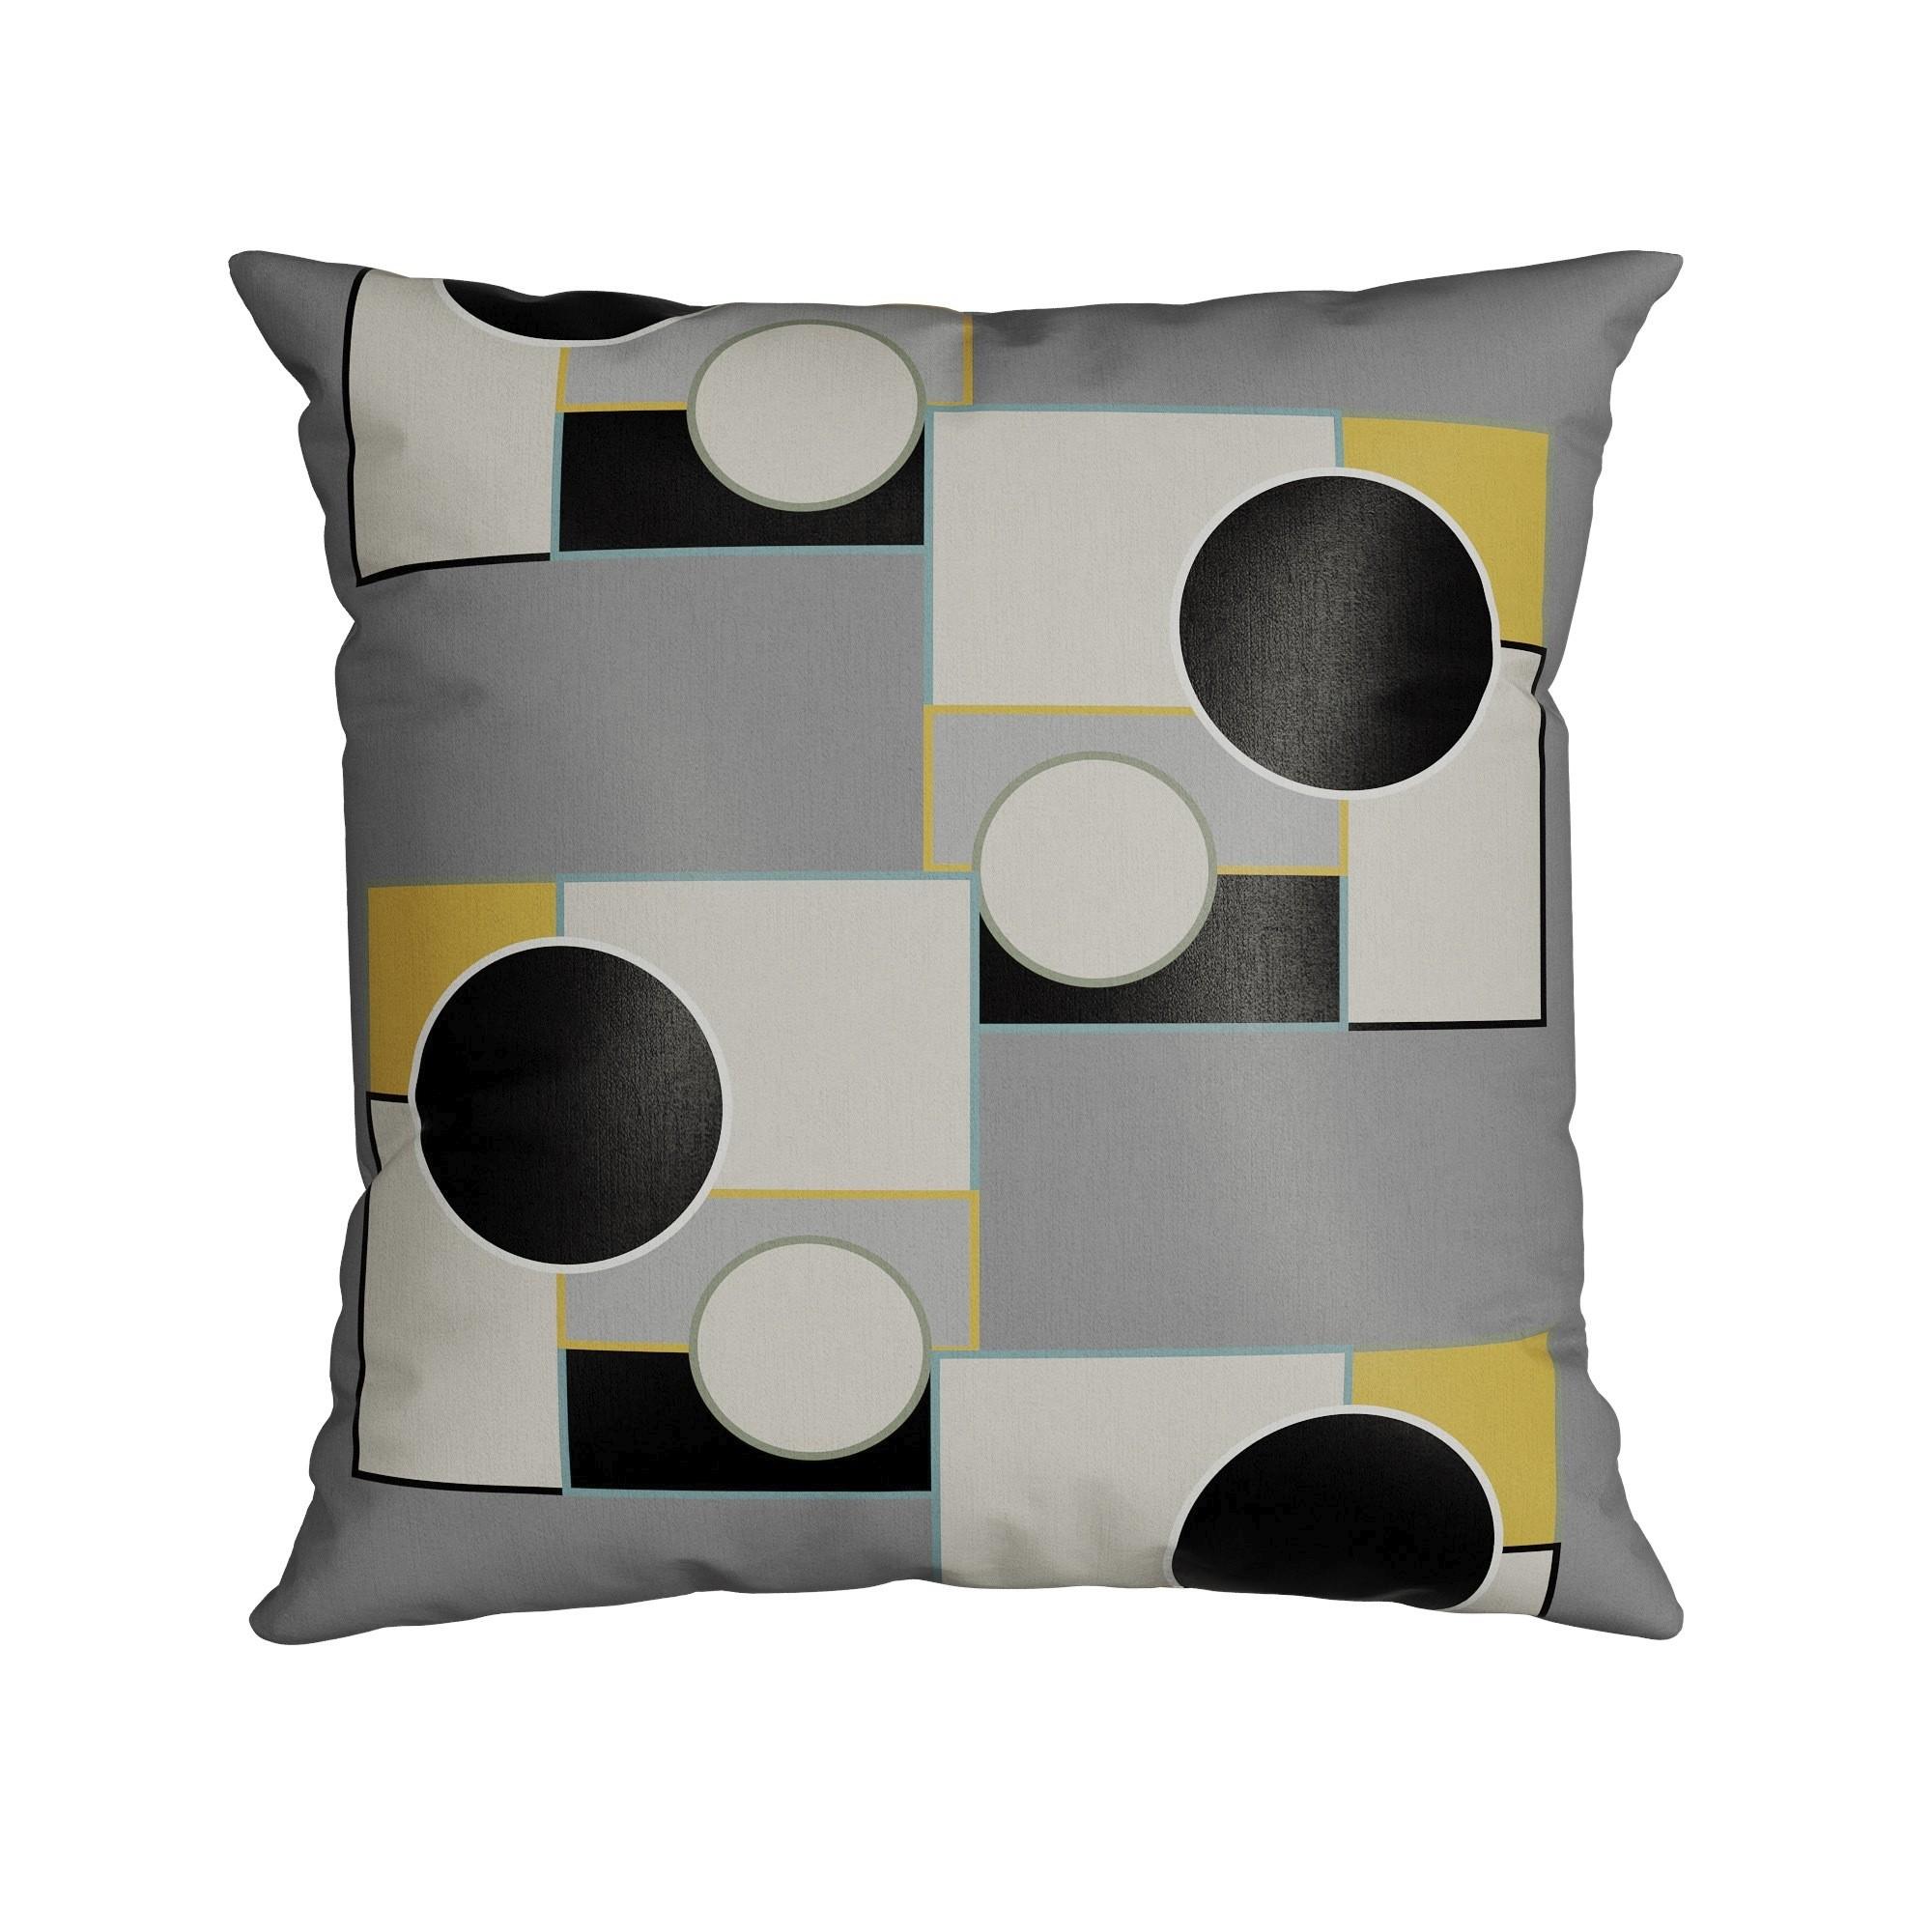 Almofada Silk Home 50x50cm 0495 - Belchior